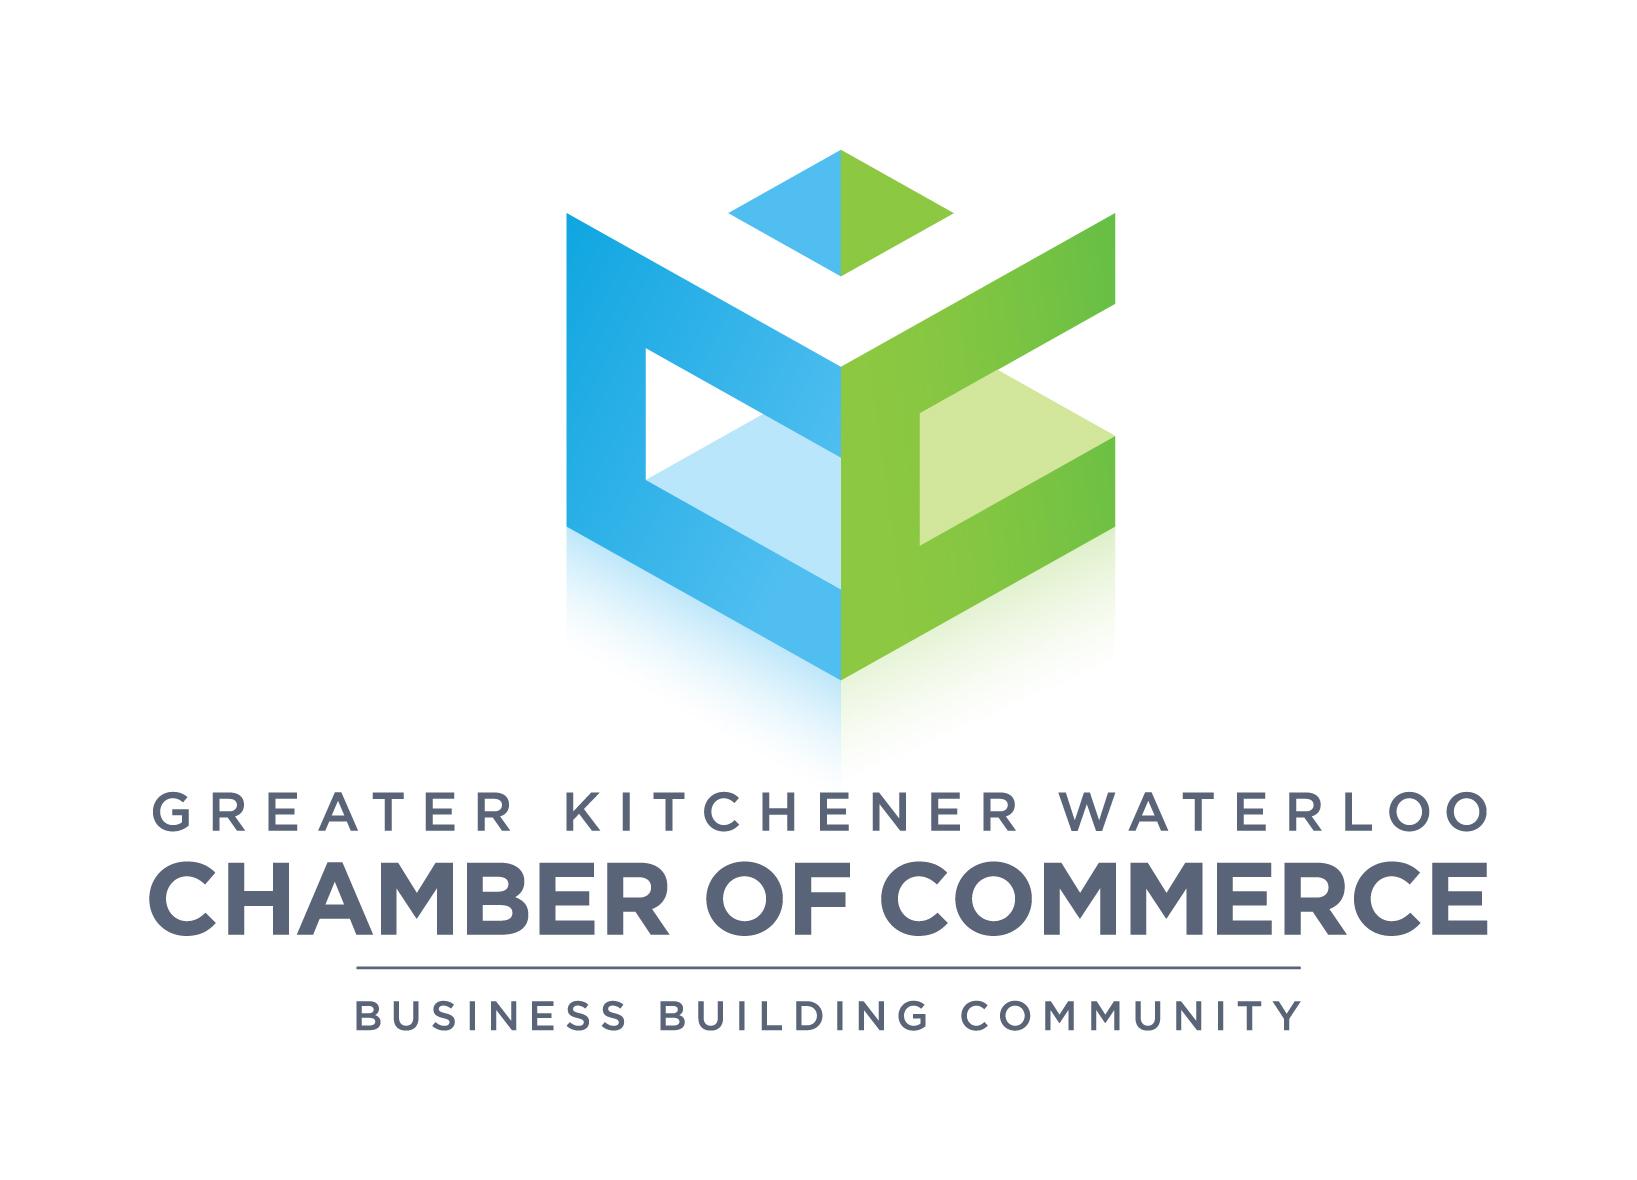 Chamber Logo - Greater Kitchener Waterloo Chamber of Commerce